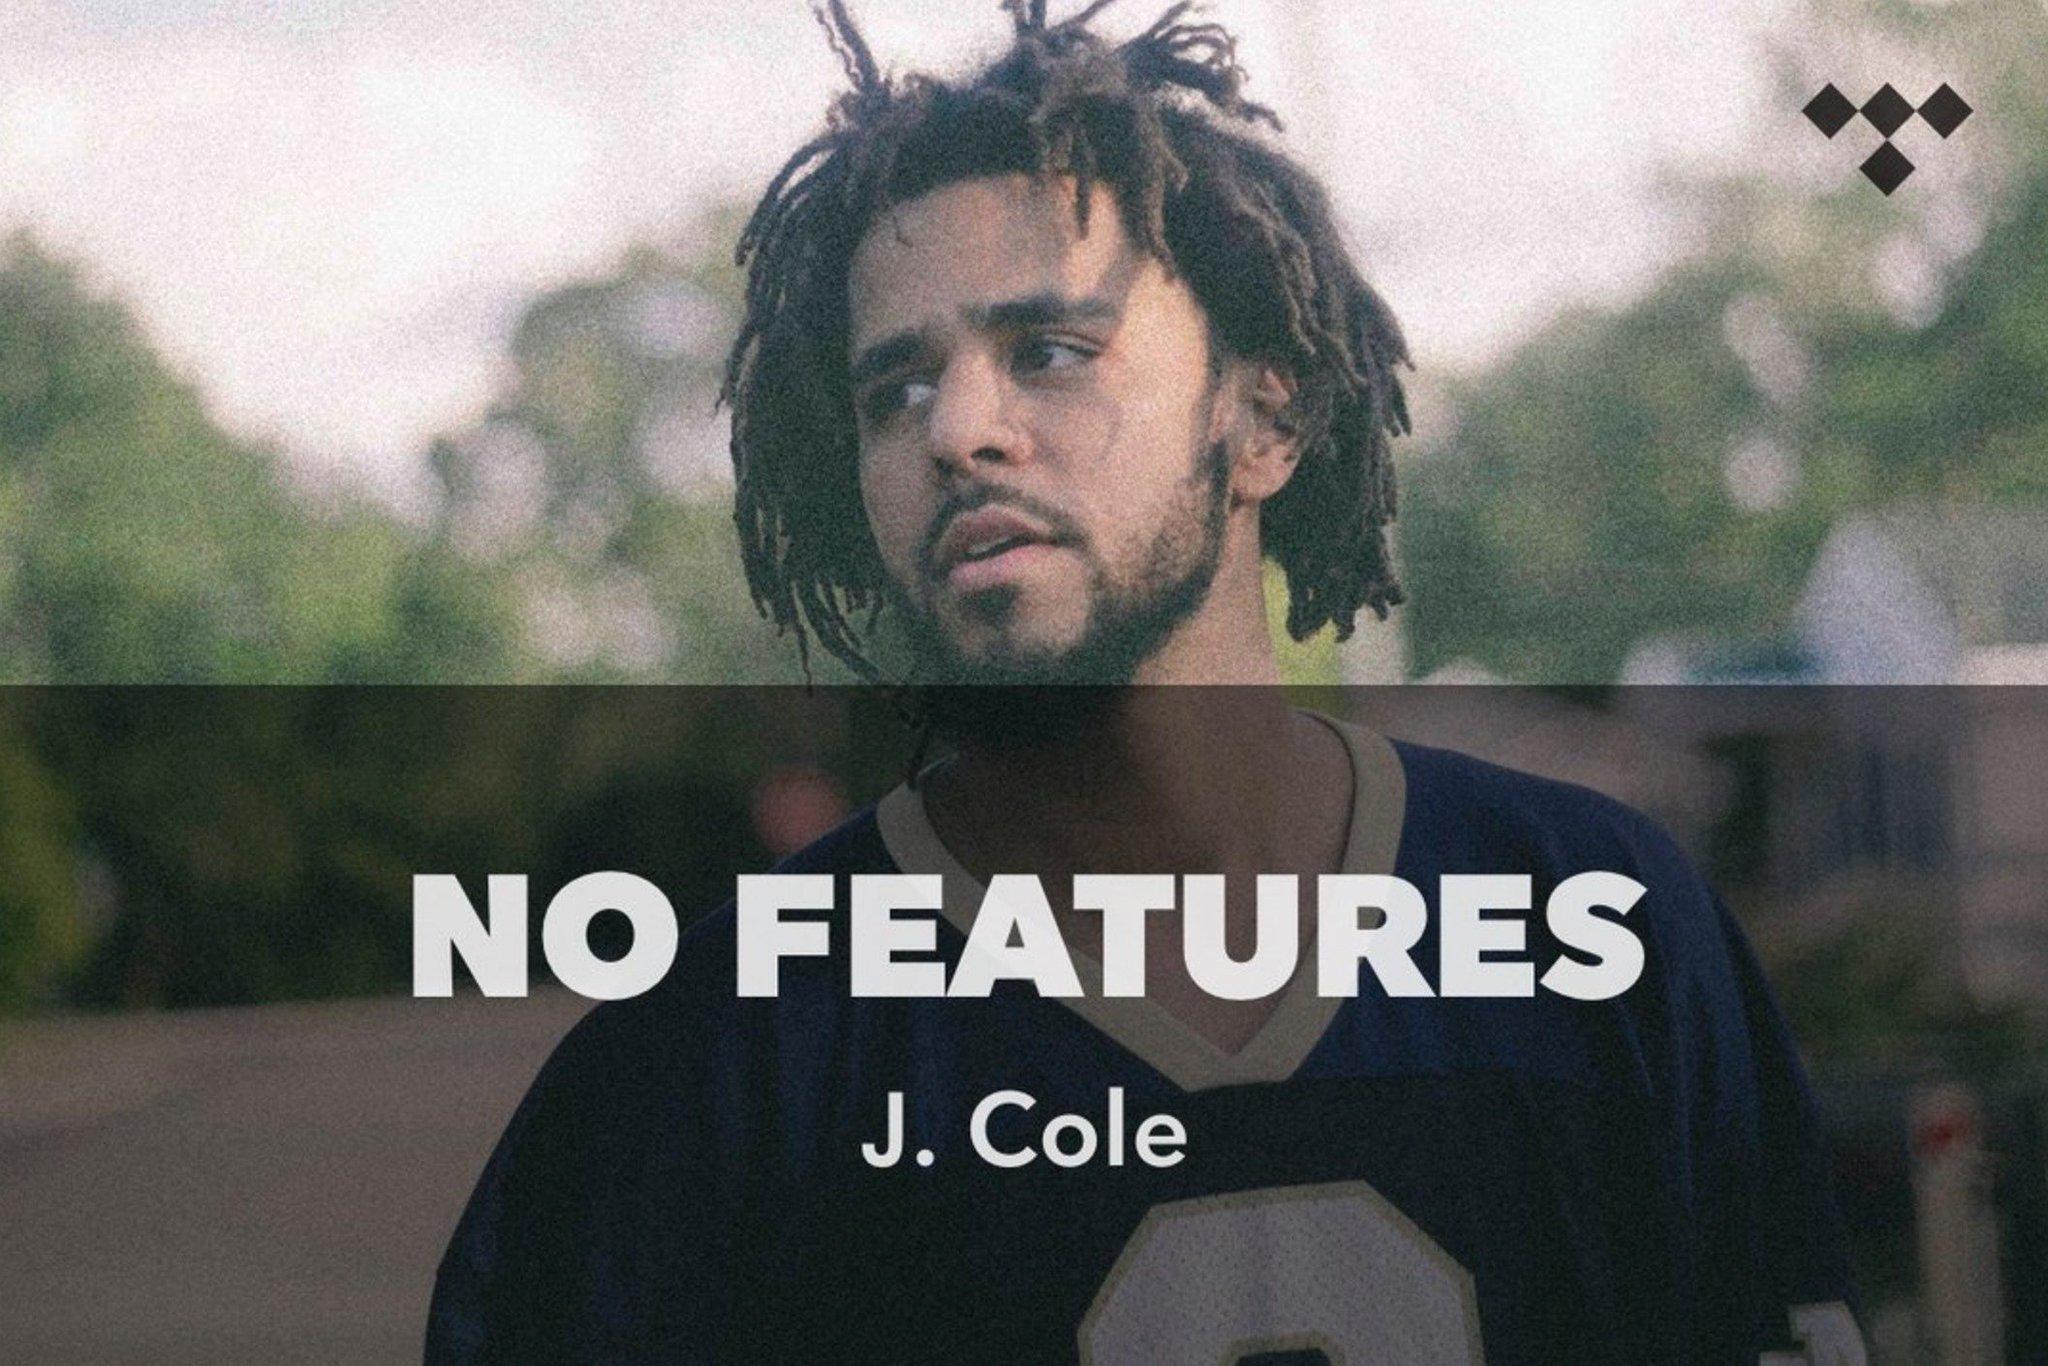 No Features: J. Cole https://t.co/j93wrzK16U #TIDAL https://t.co/UUavF2WWtz